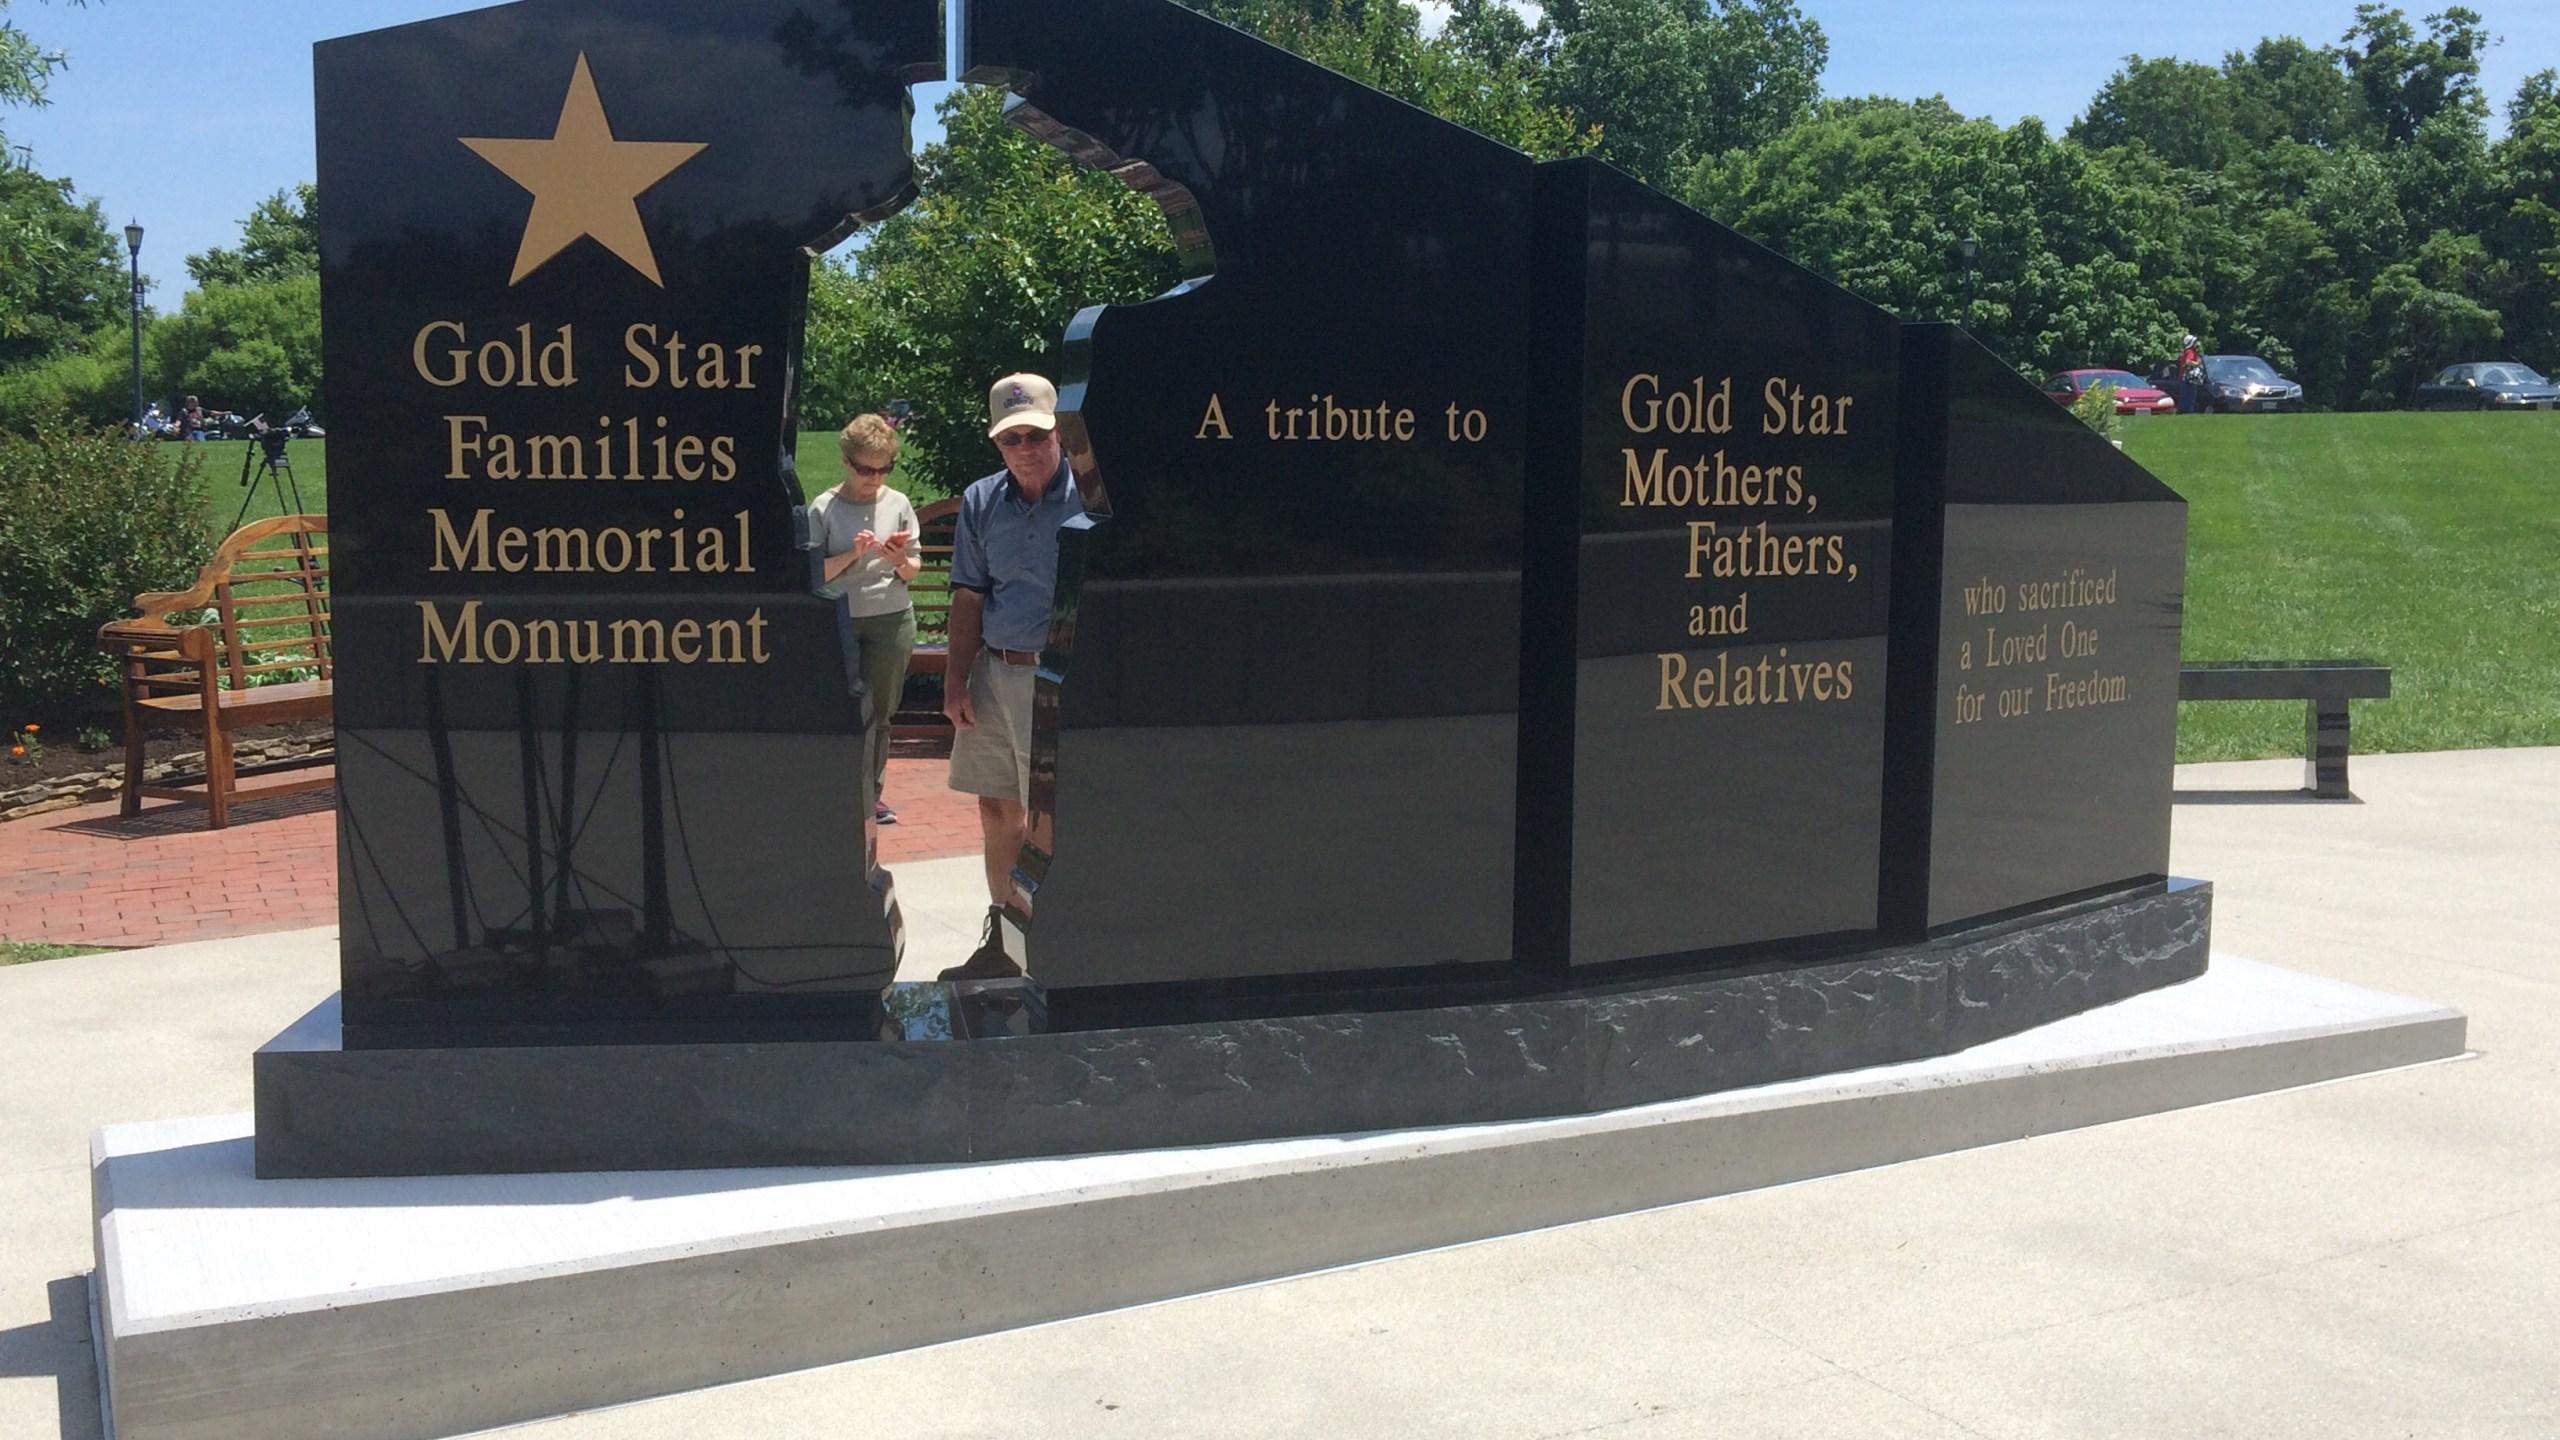 Gold Star Families Monument_1496098102233.jpg